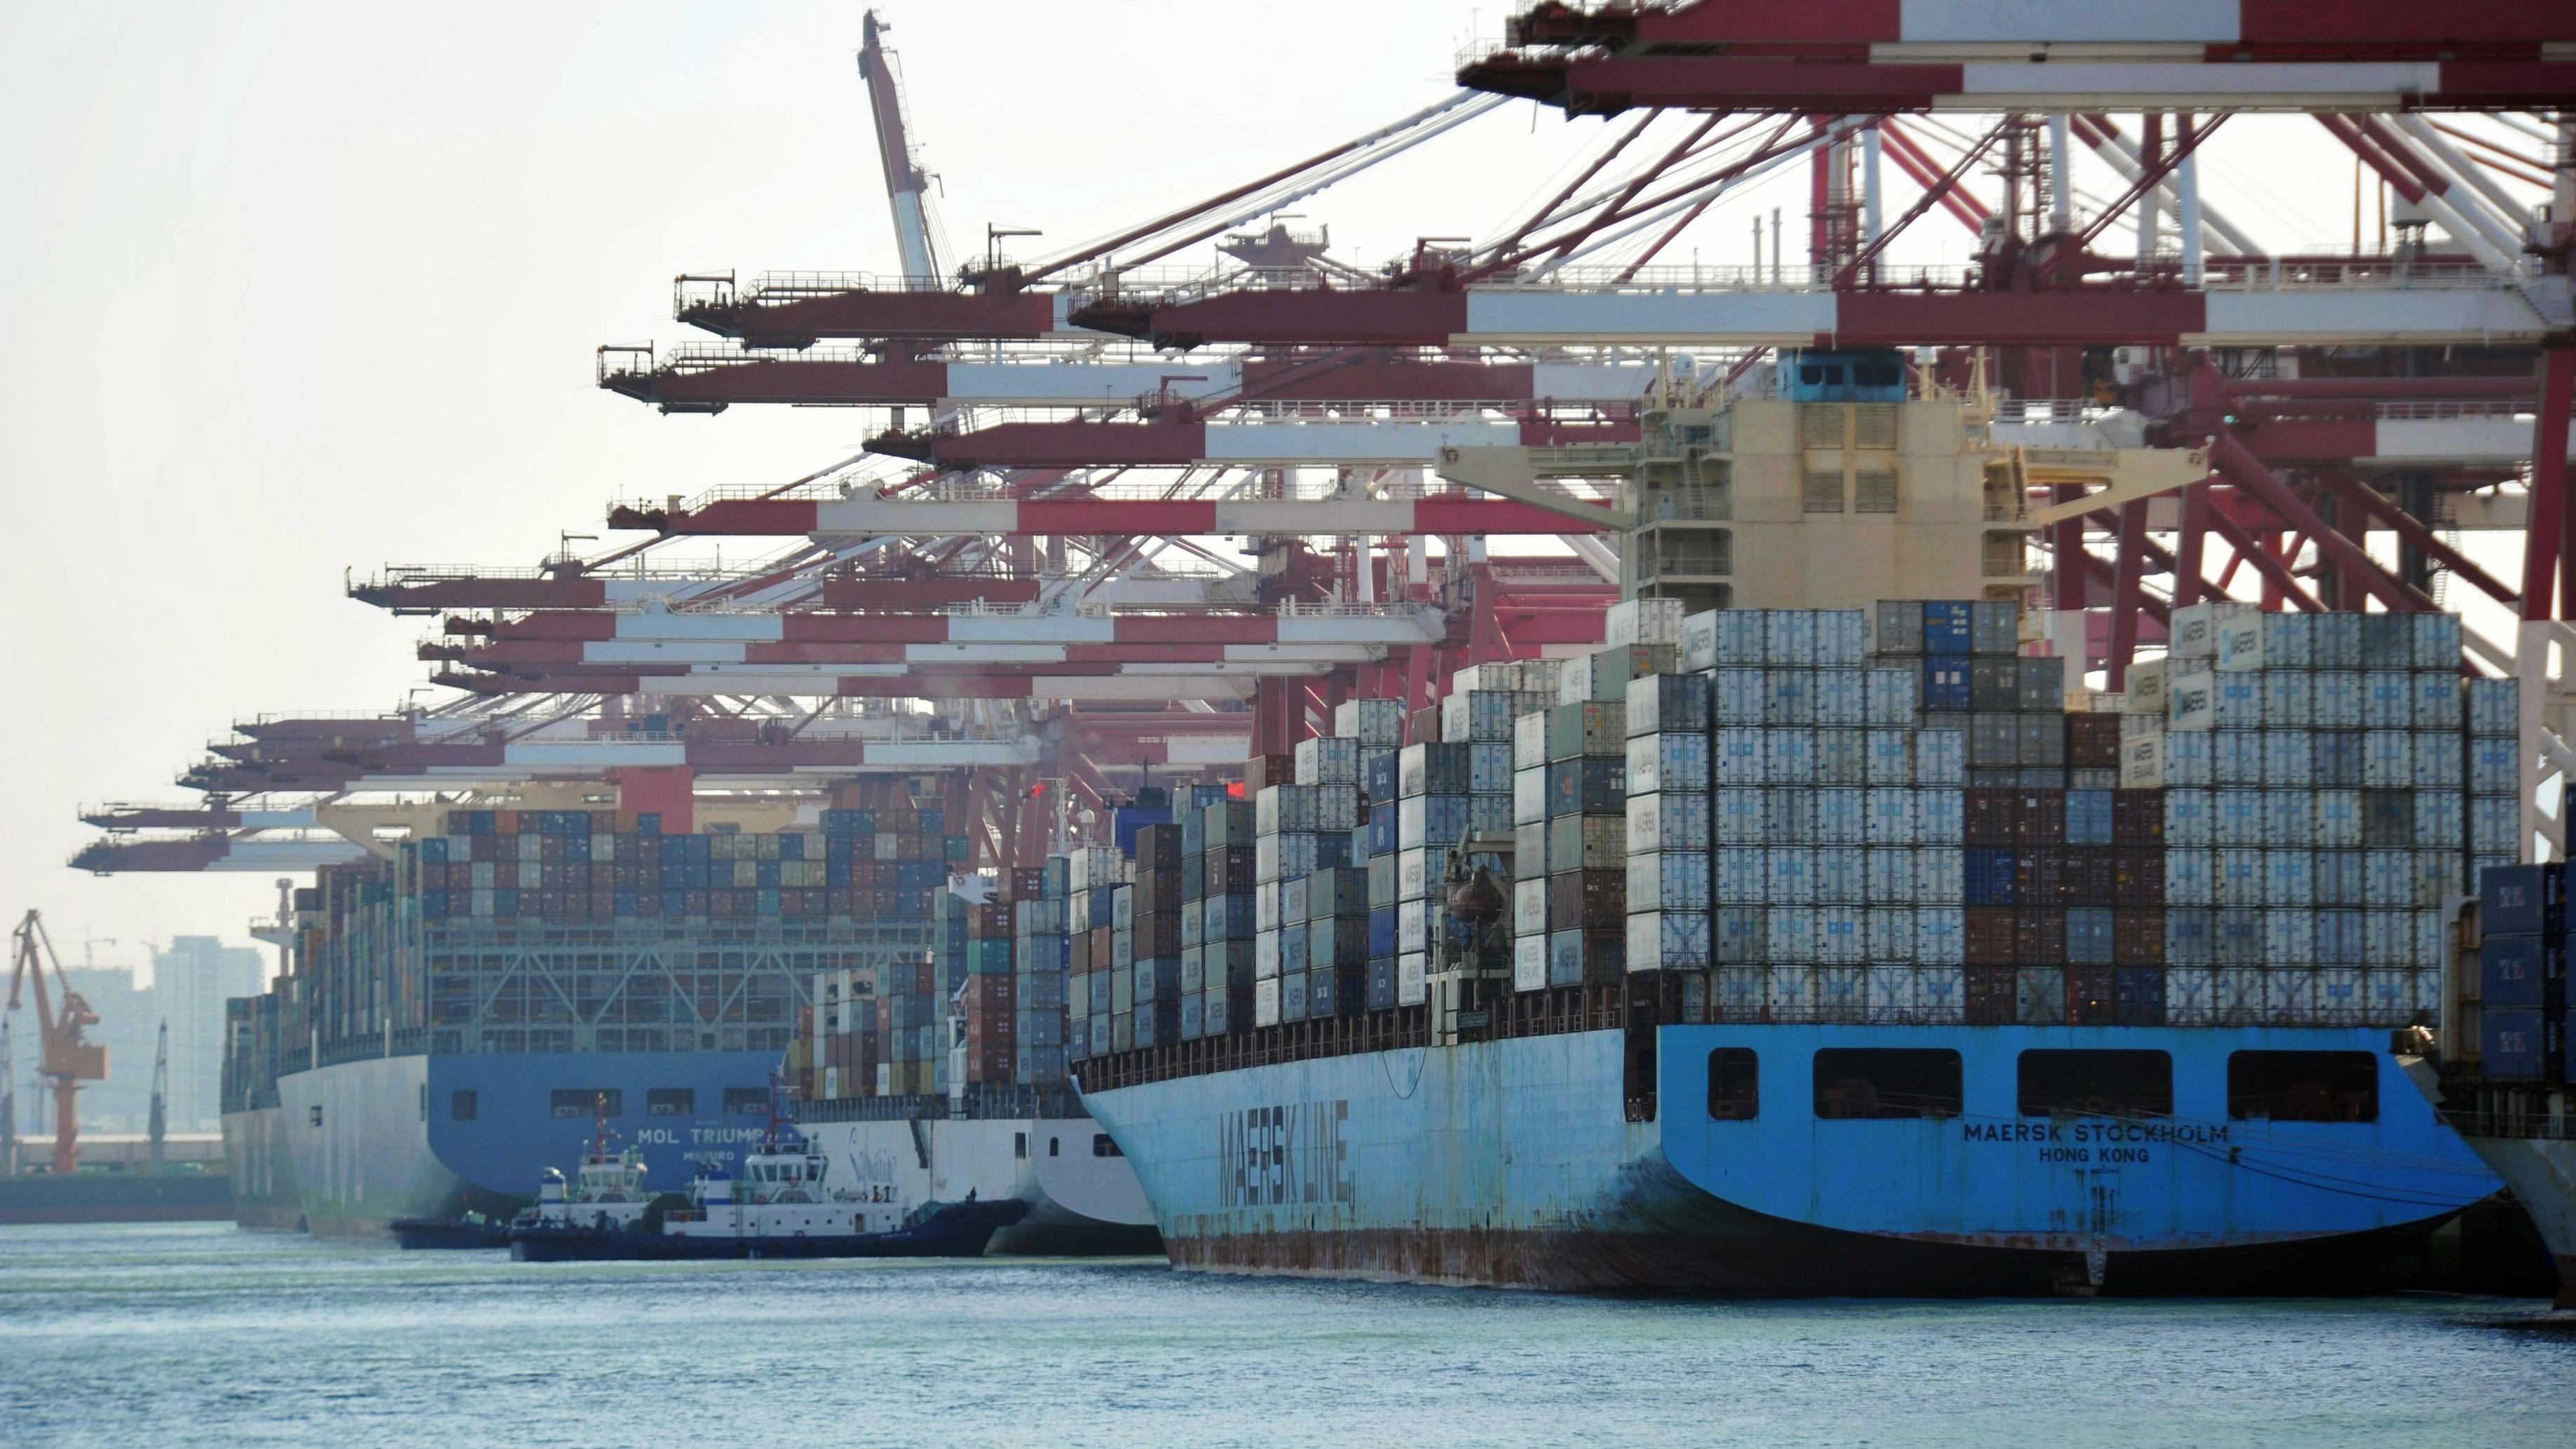 npr.org - Anthony Kuhn - China Sets Tariffs On $60 Billion In U.S. Goods, Retaliating Against U.S. Duties